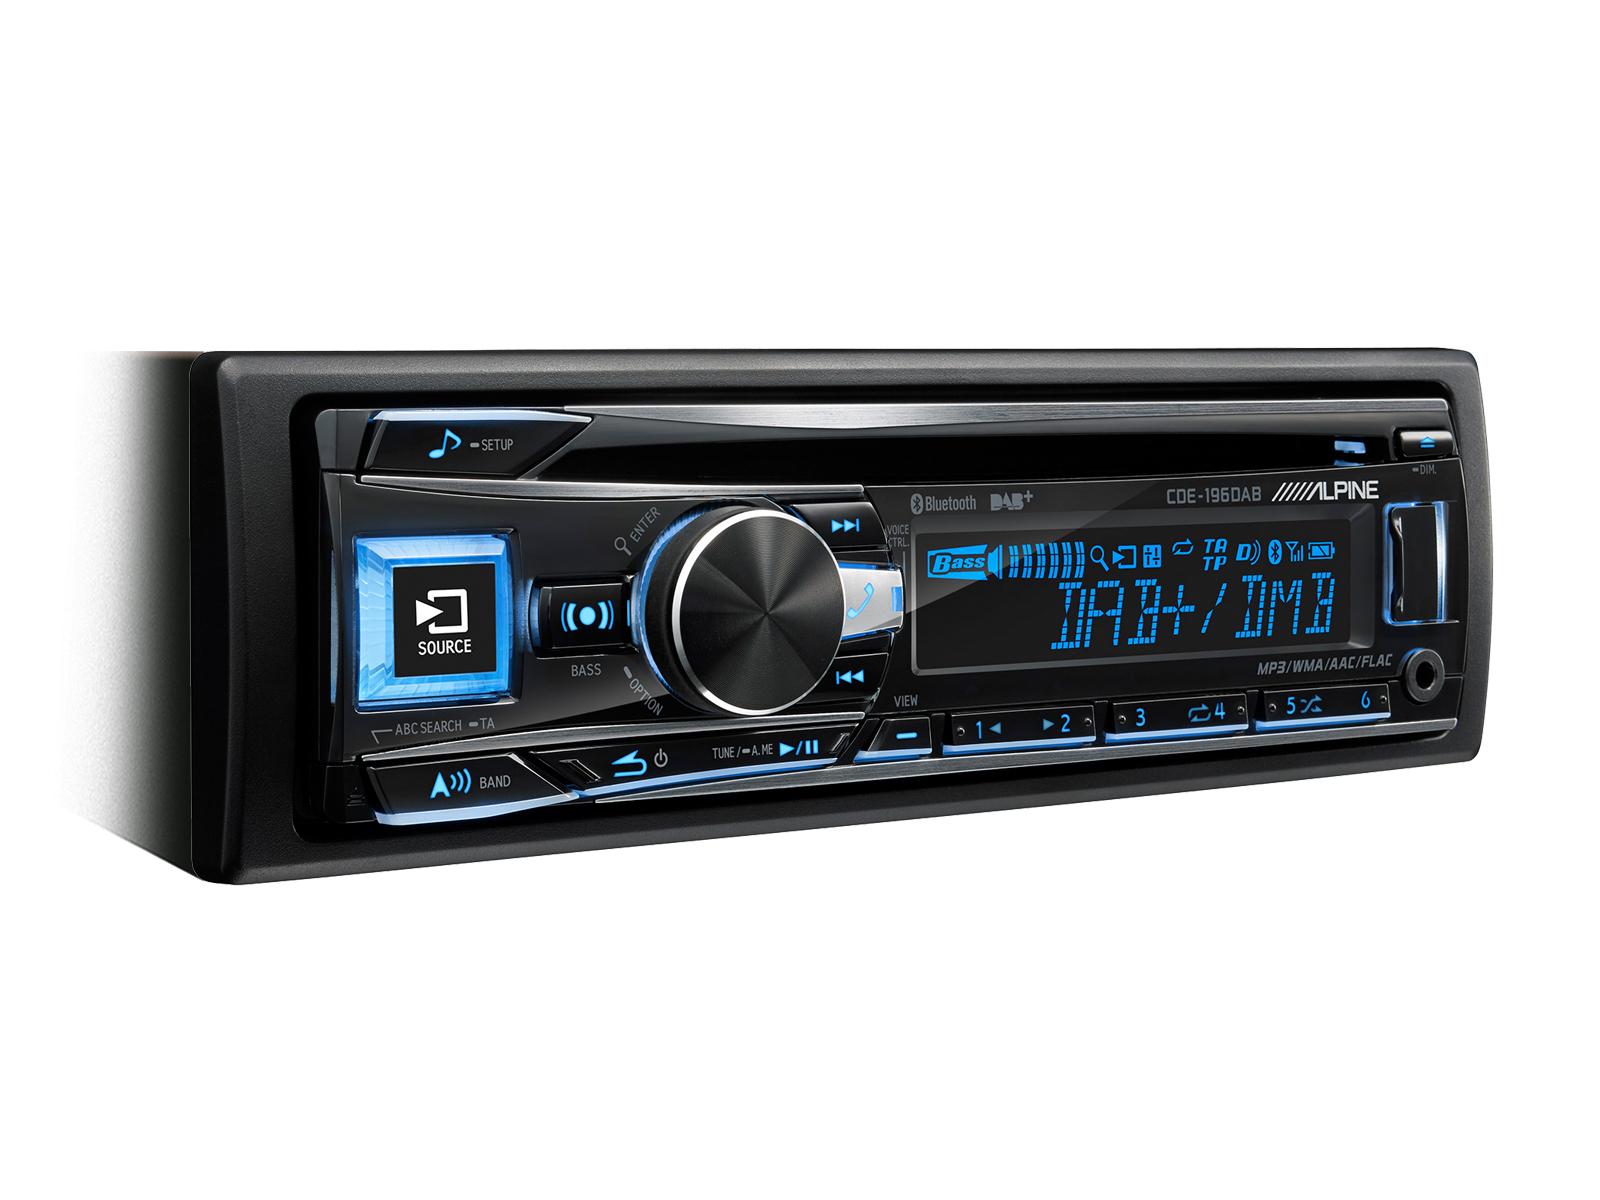 Alpine CDE-196DAB CD/DAB+ RECEIVER MIT BLUETOOTH Autoradio DAB+/UKW/MW/LW-RDS-Tuner